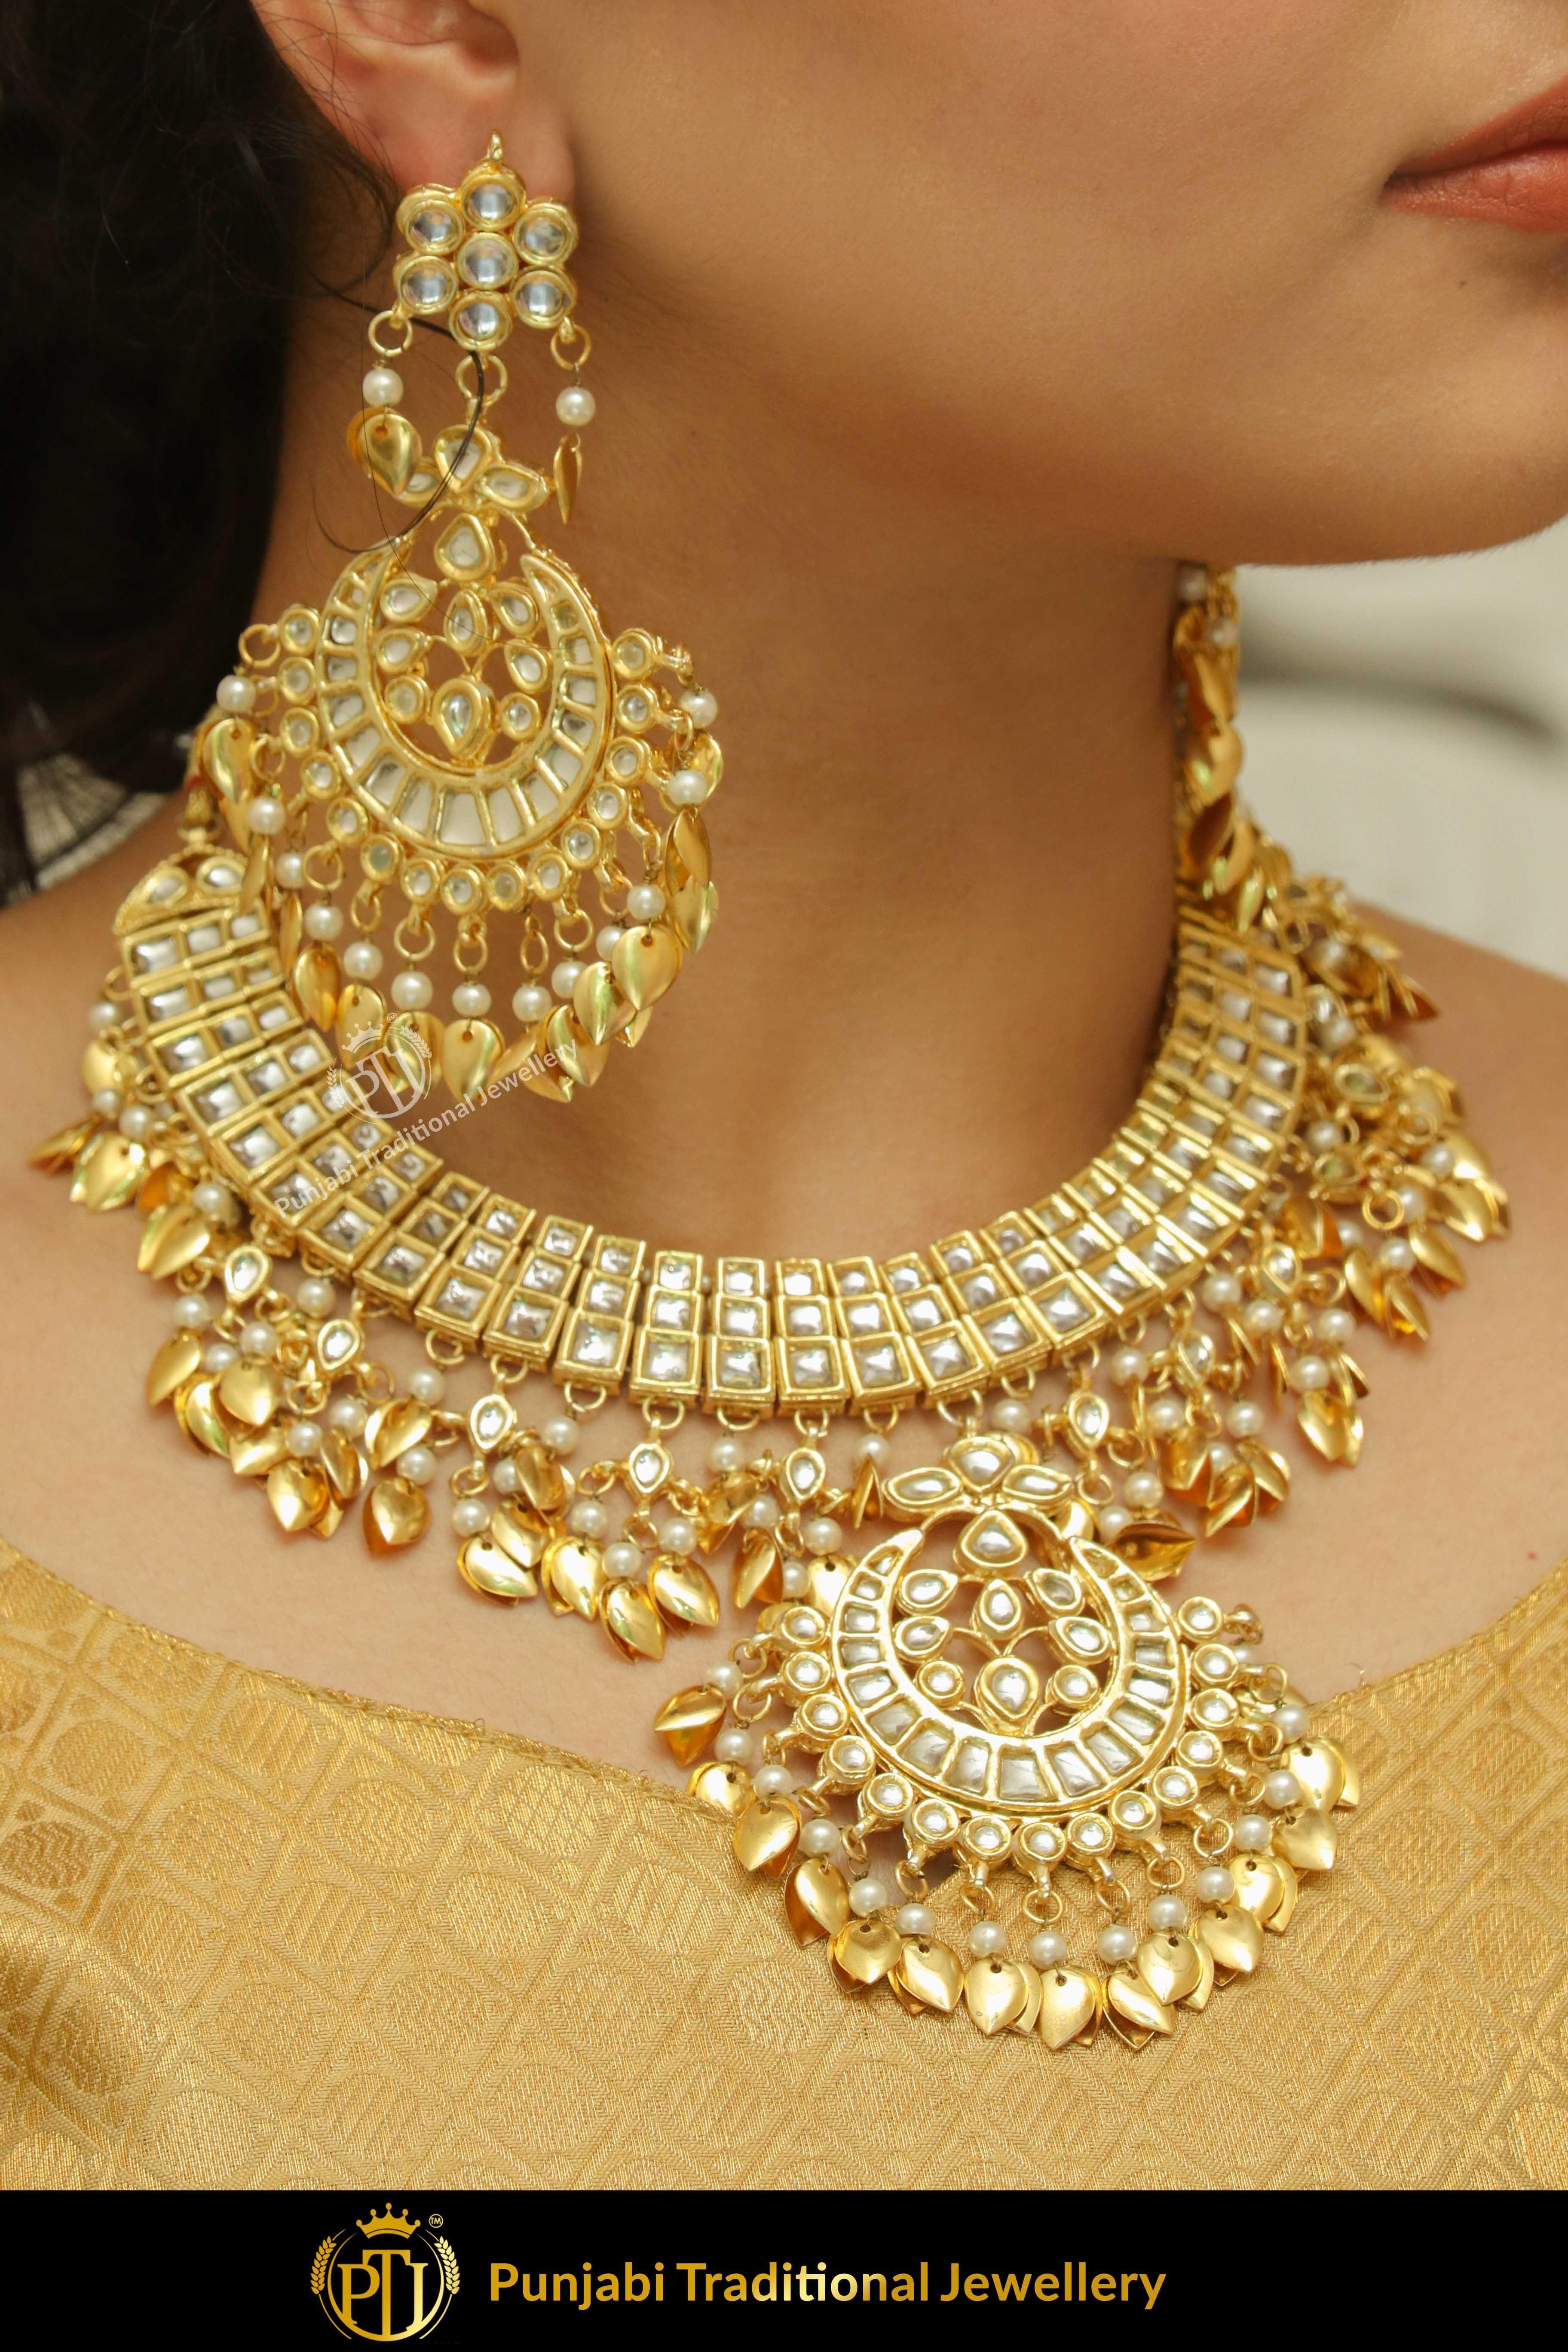 76053ae8e8 Buy Punjabi Best Design Bridal Chura Online In Us, Uk Shop Now | Punjabi Traditional  Jewellery